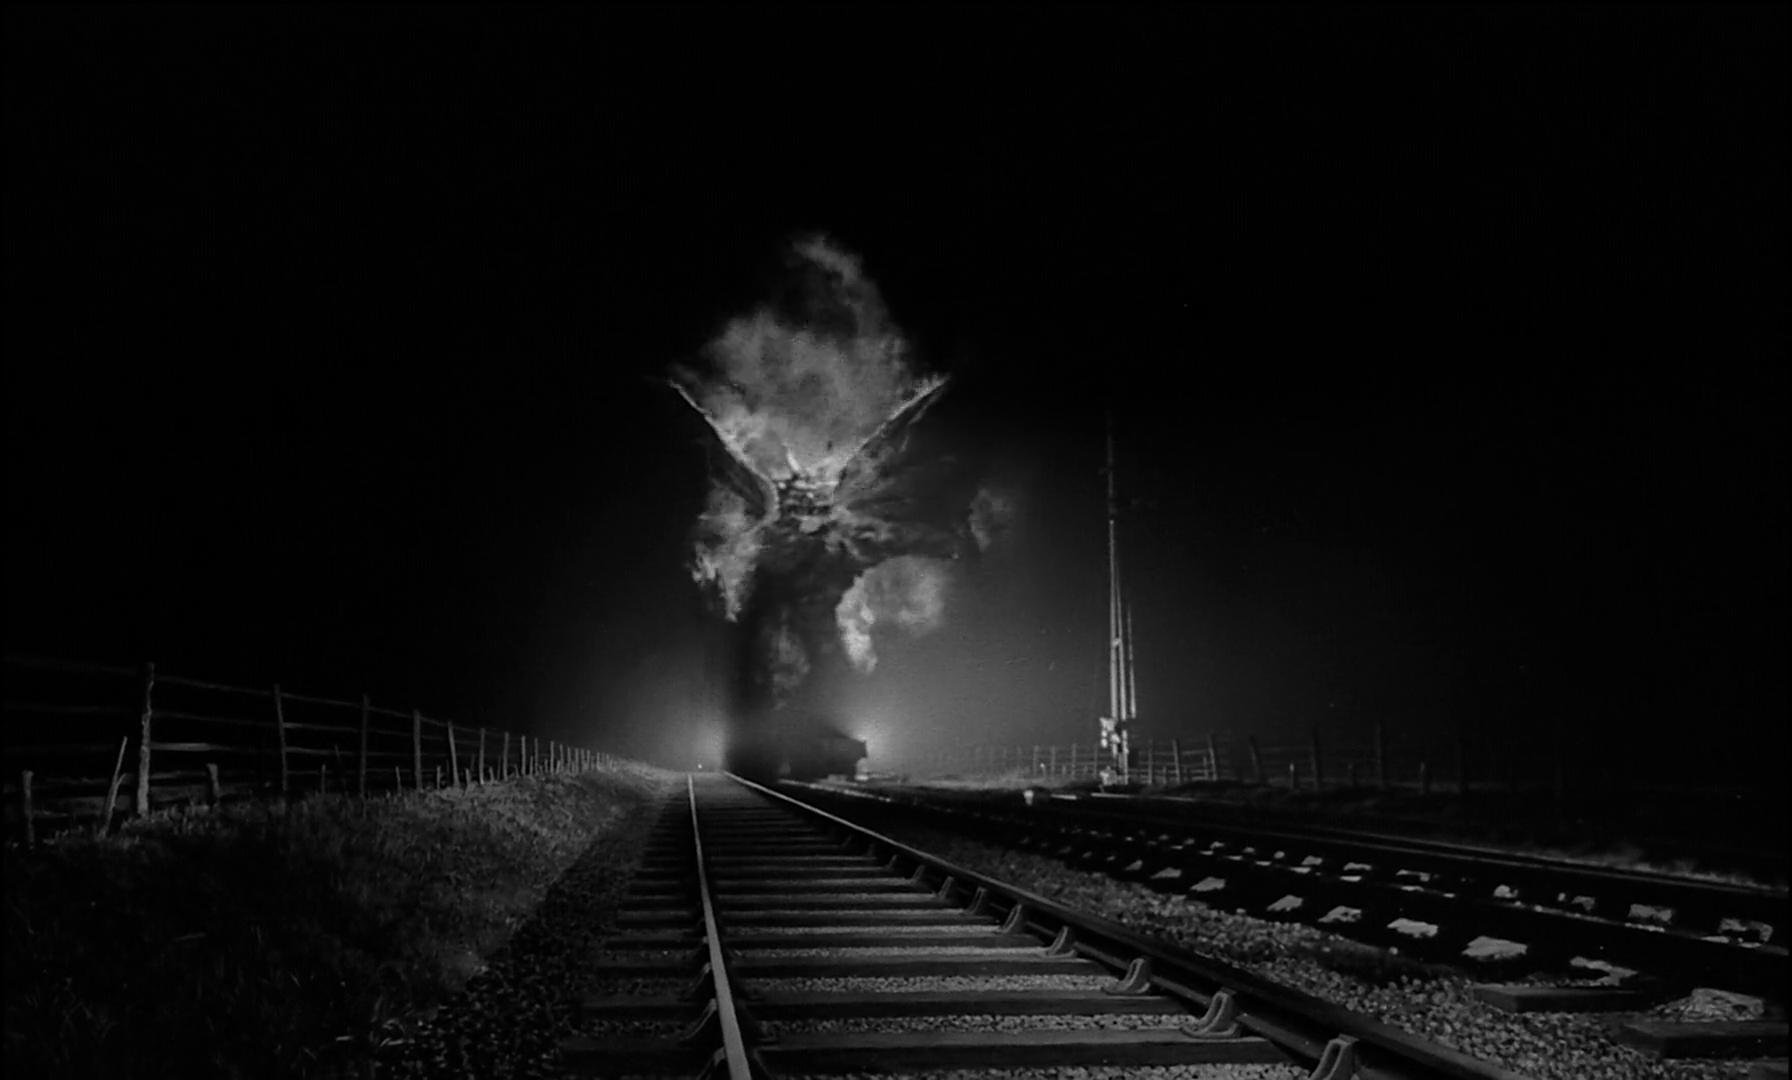 la notte del demonio 3